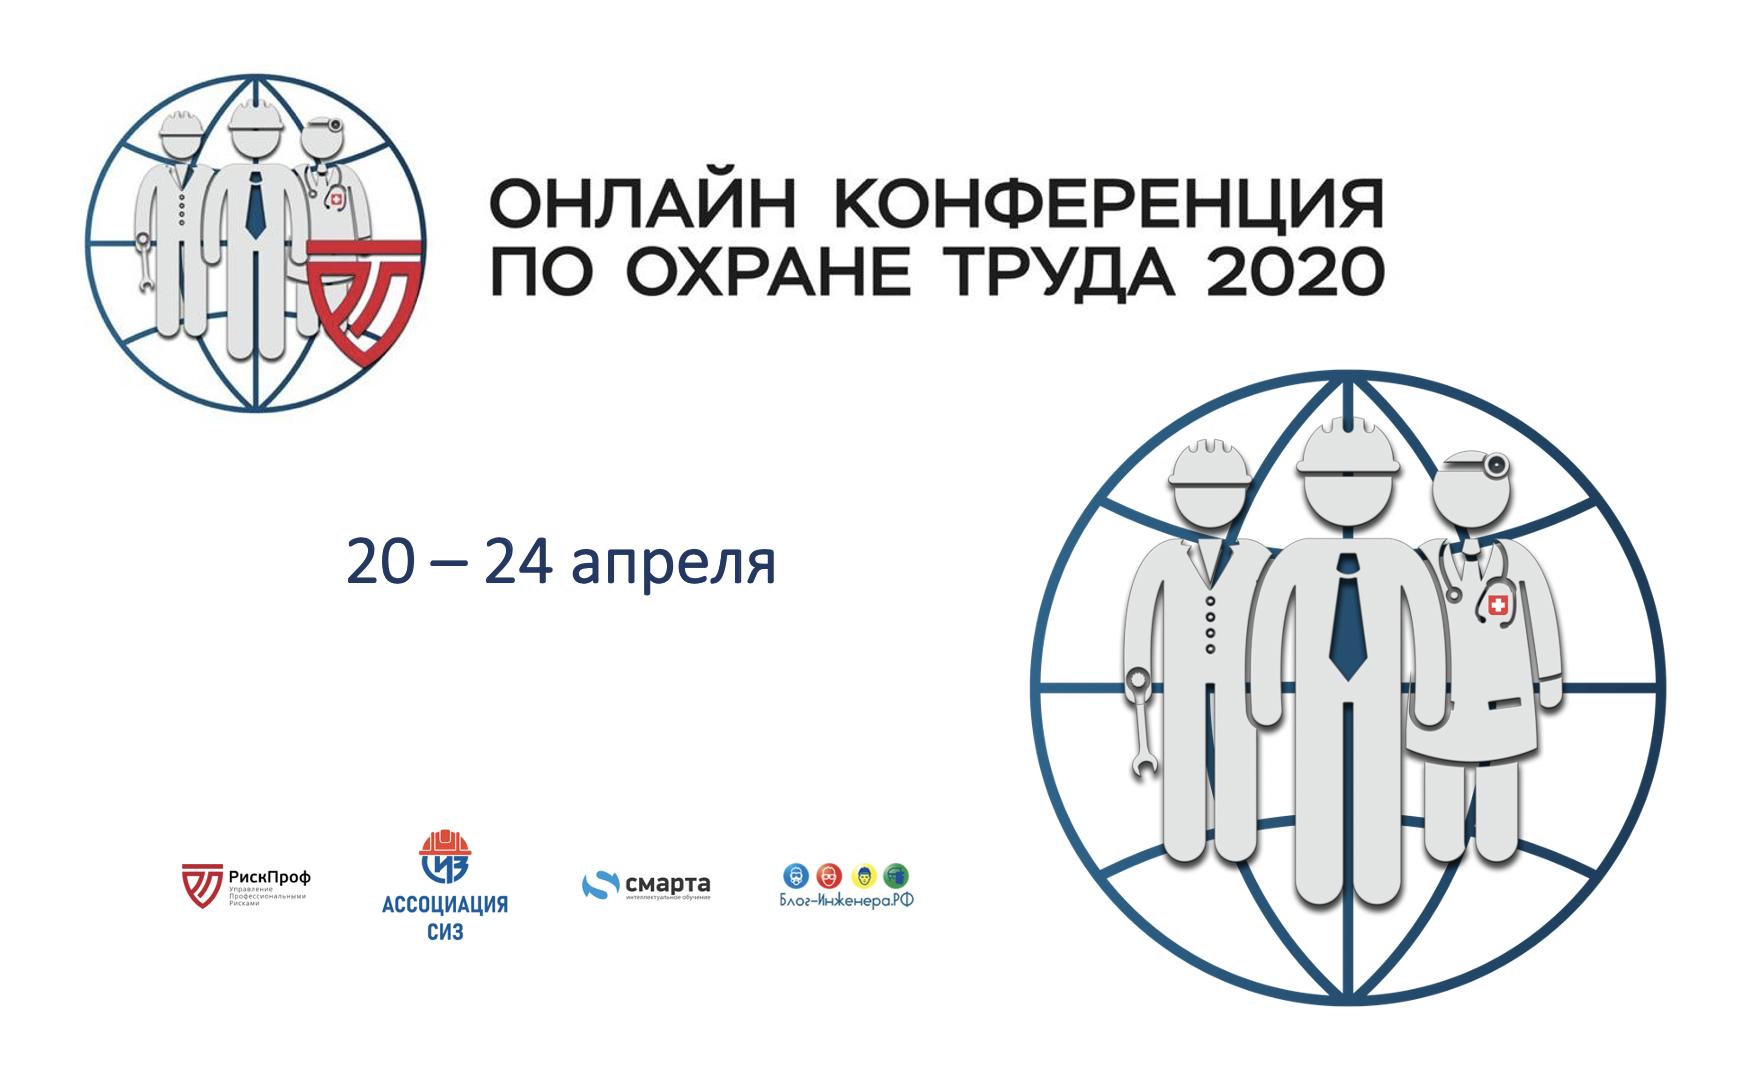 Онлайн конференция по охране труда - 2020